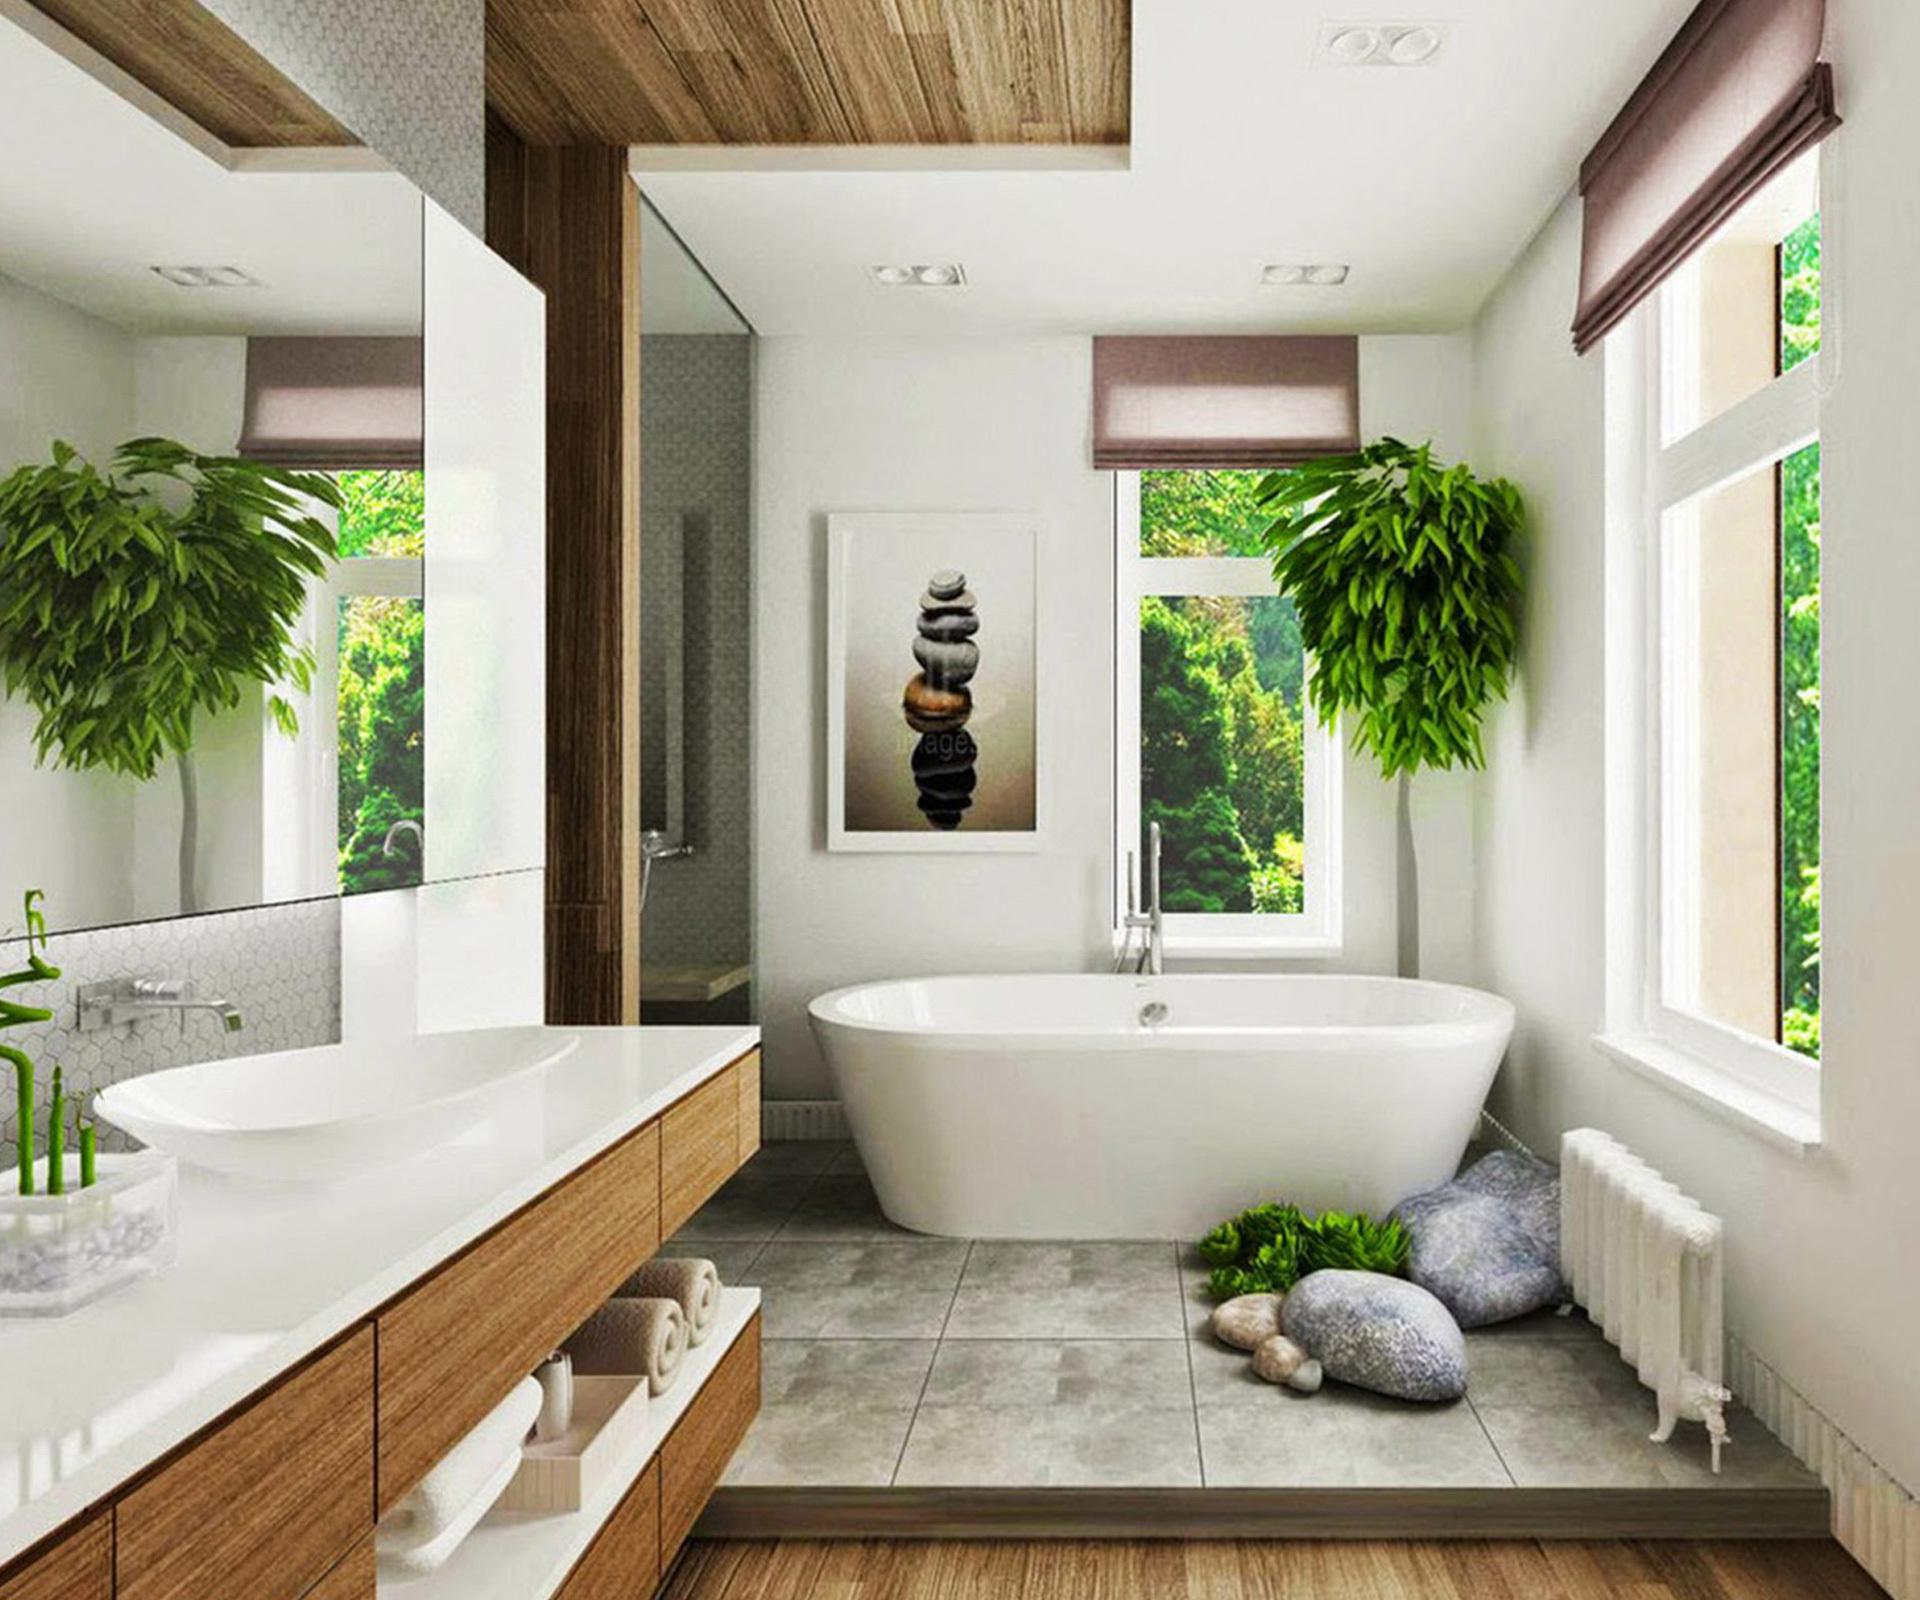 pokok-toilet-5.jpg